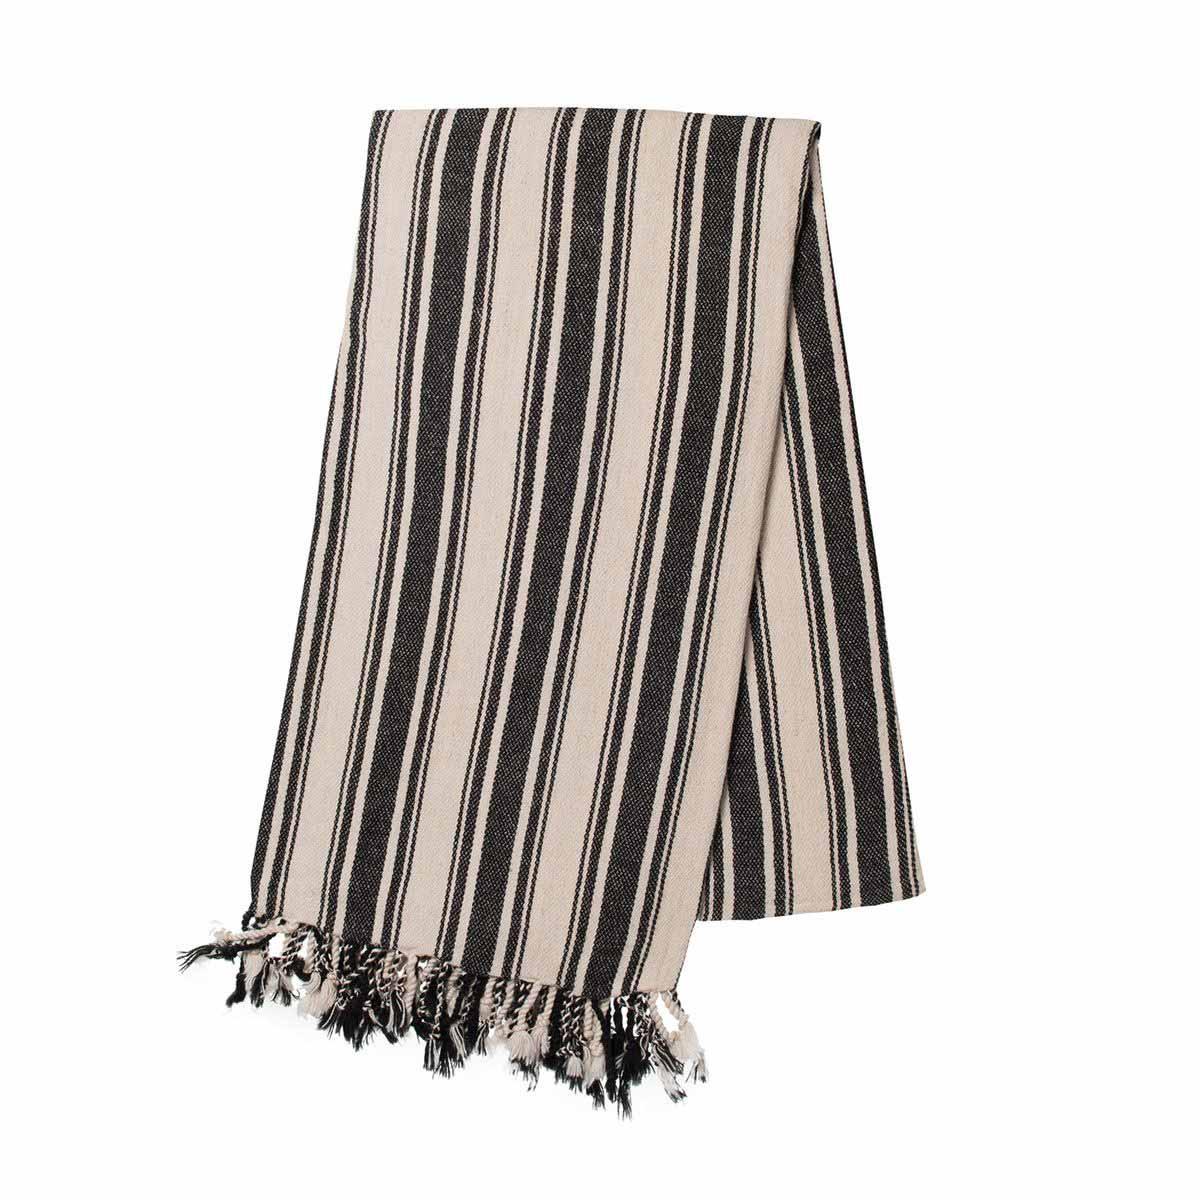 Buldano Turkish Towel - Verti Stripes Black